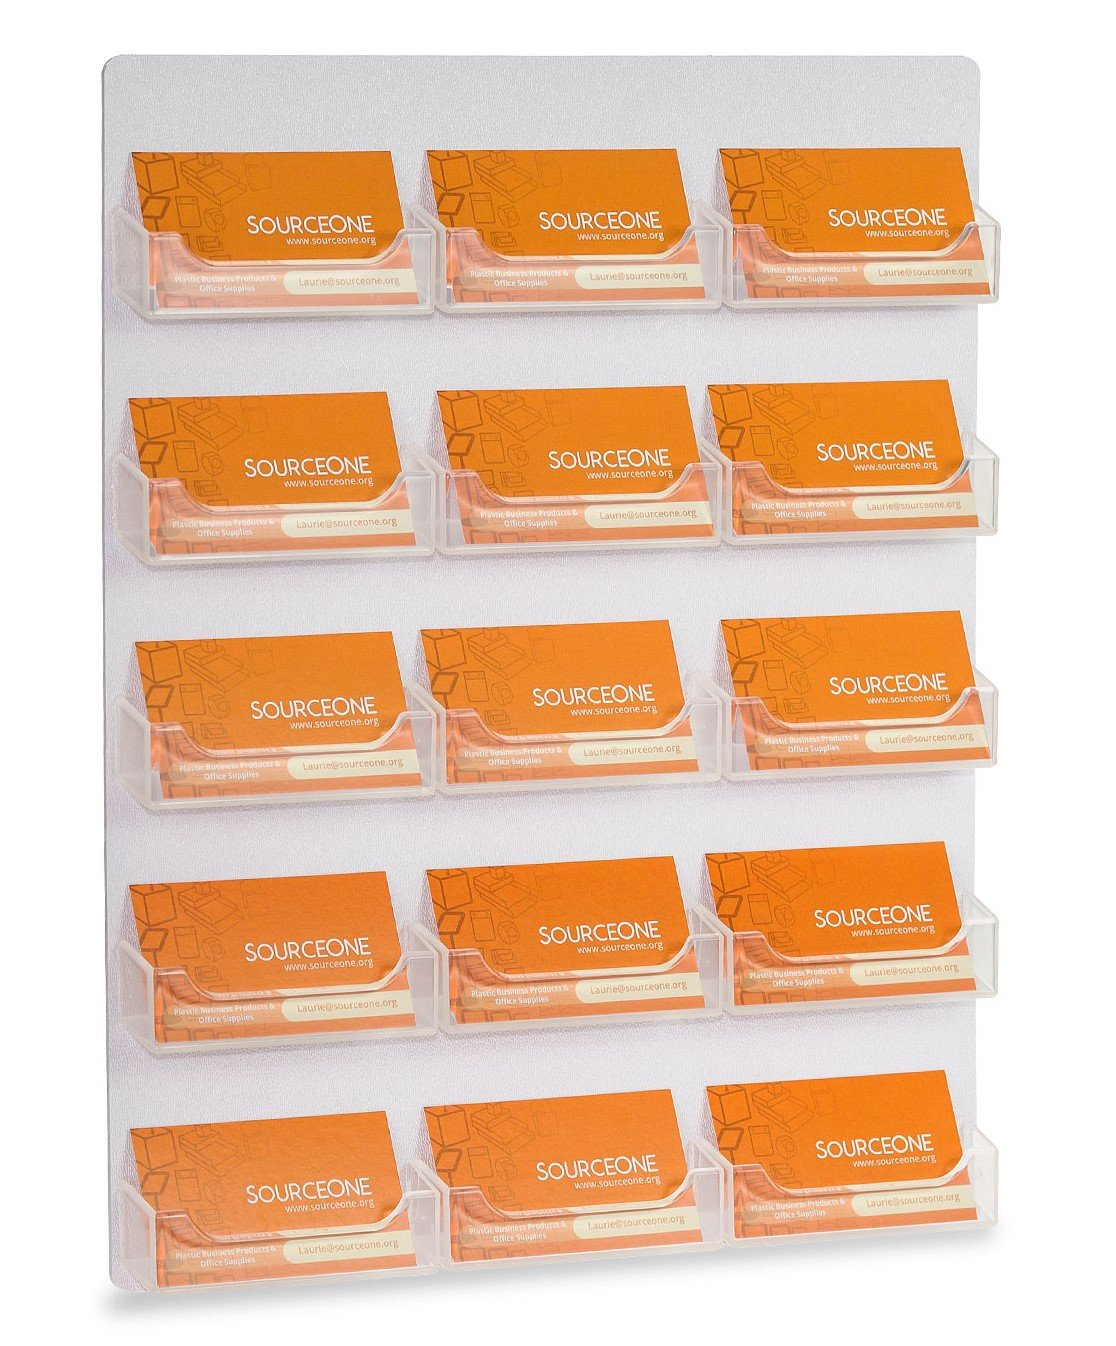 Source One 15 Pocket Wall Mount Premium Business Card Holder Display (BC-WM-15Pkt)